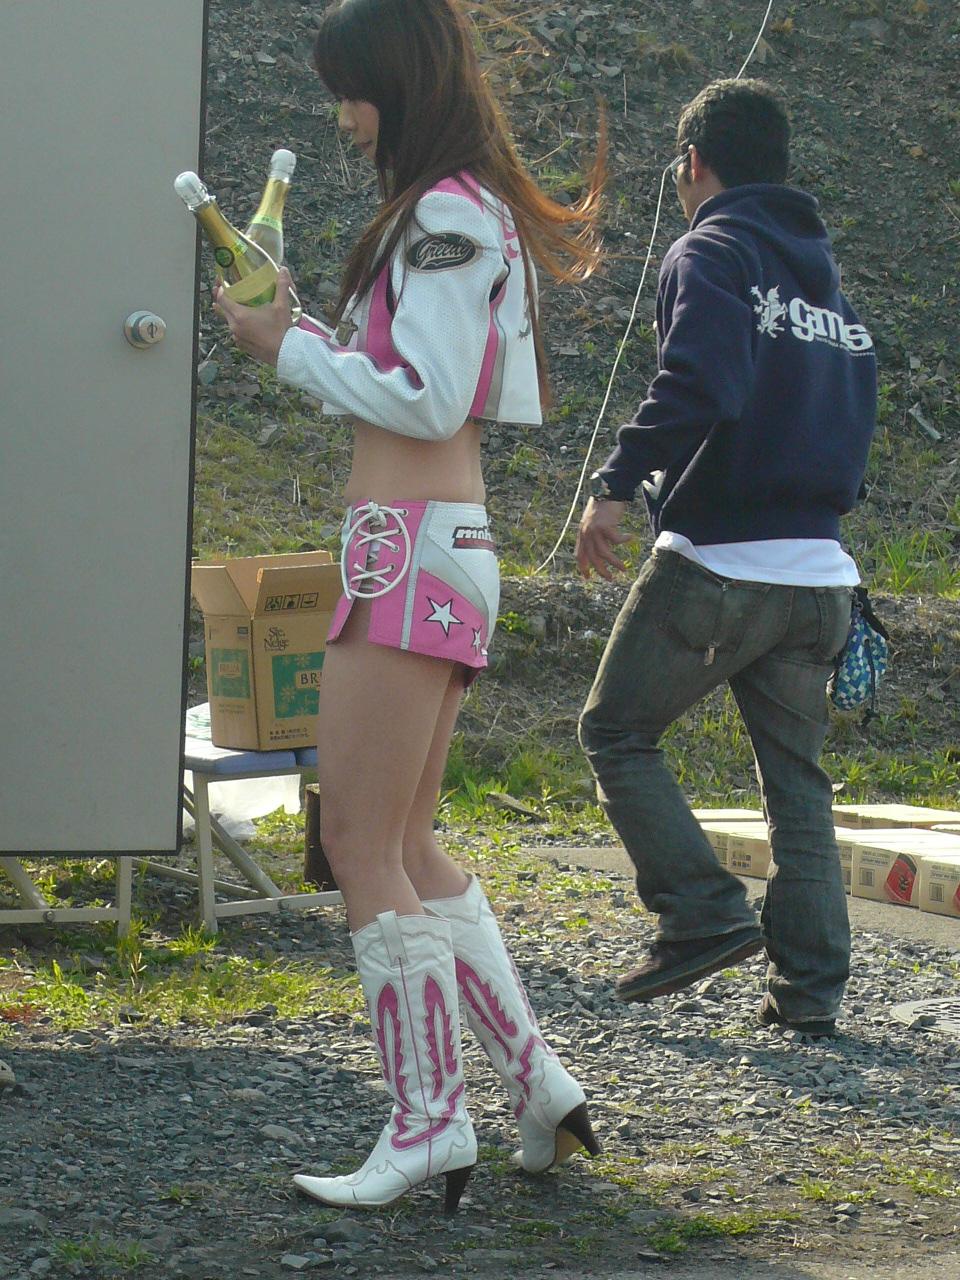 http://img.blogs.yahoo.co.jp/ybi/1/13/f5/tetsutaro499/folder/420377/img_420377_47575613_10?1240324968